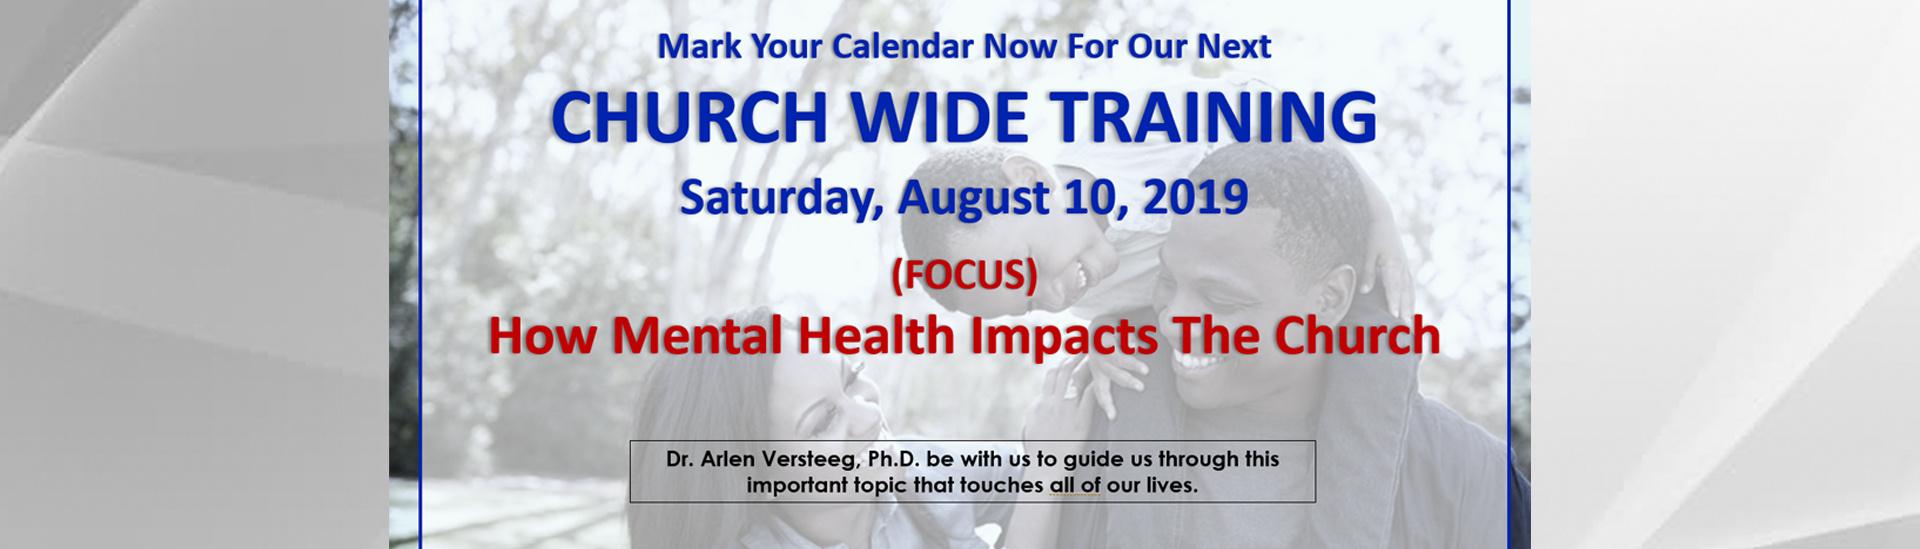 https://0201.nccdn.net/1_2/000/000/0ab/97d/churchwide-training-1920x549.jpg